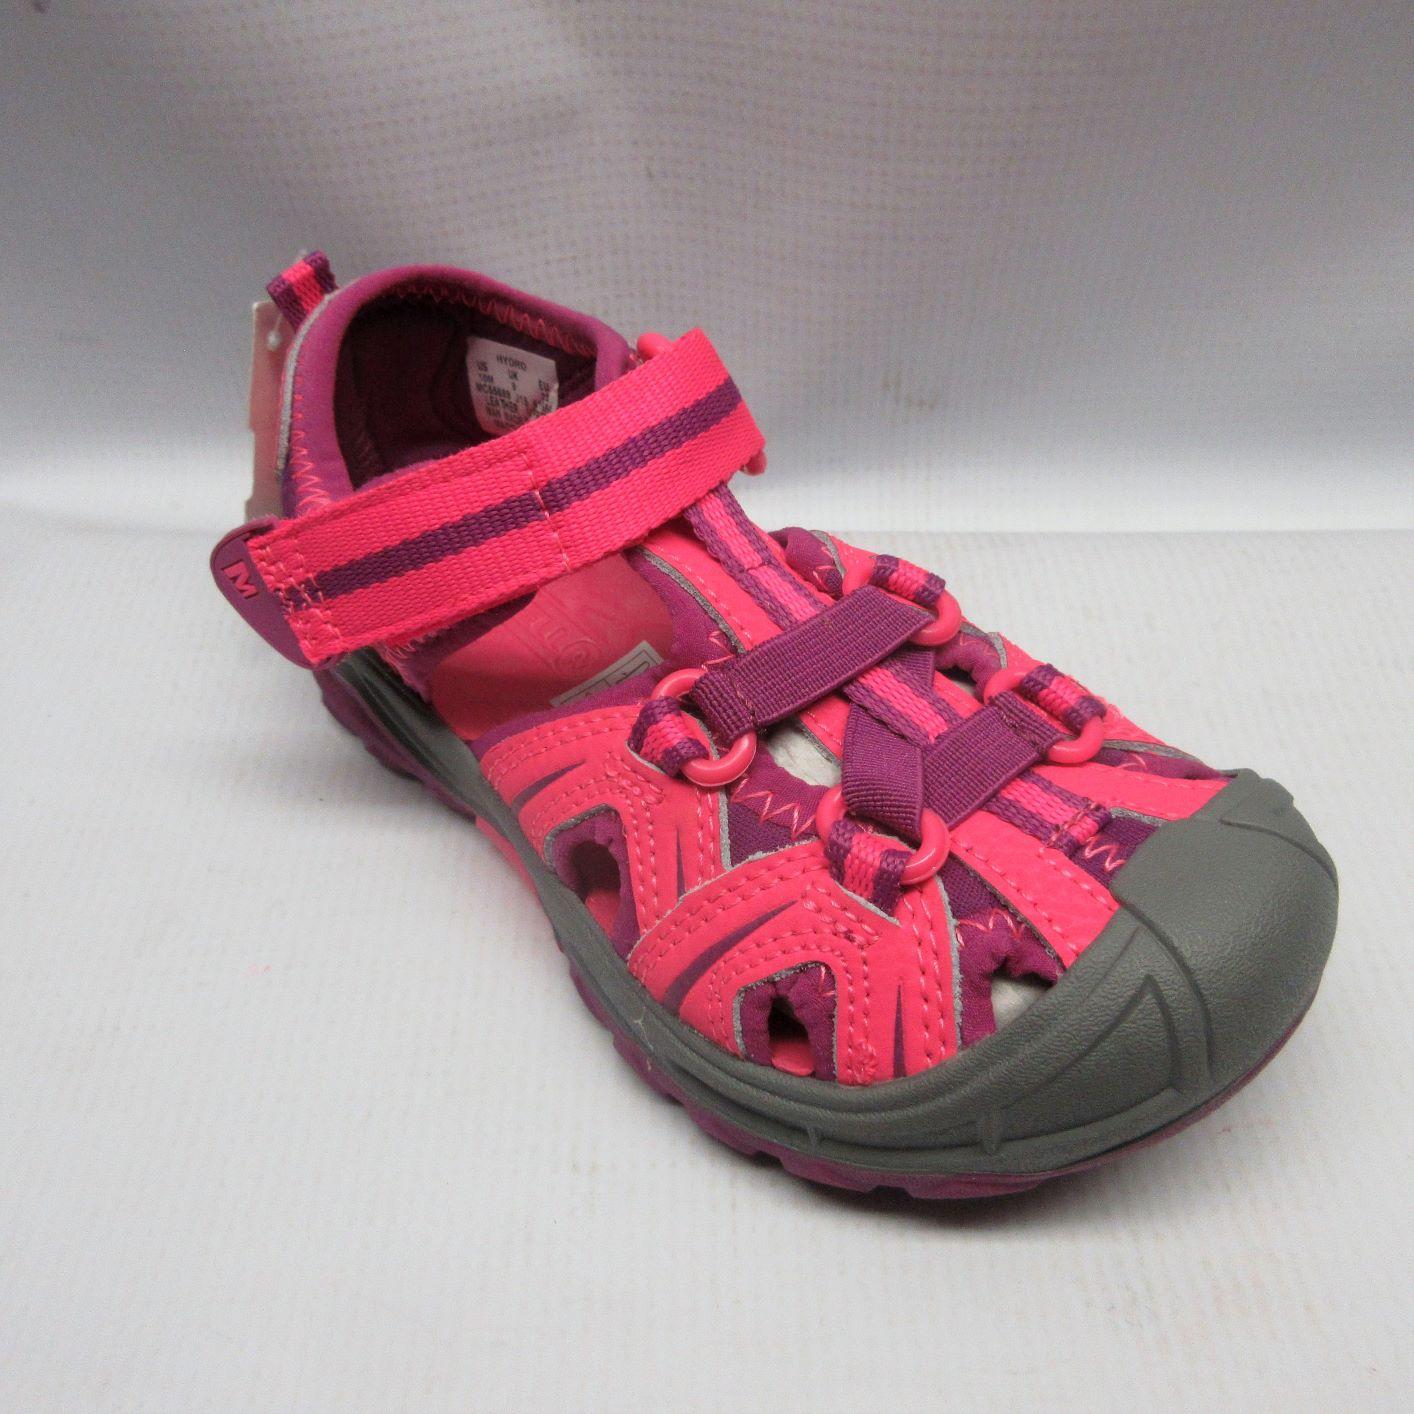 f2770ad95928 Merrell Sandals Children Hydro in Pink — Cabaline